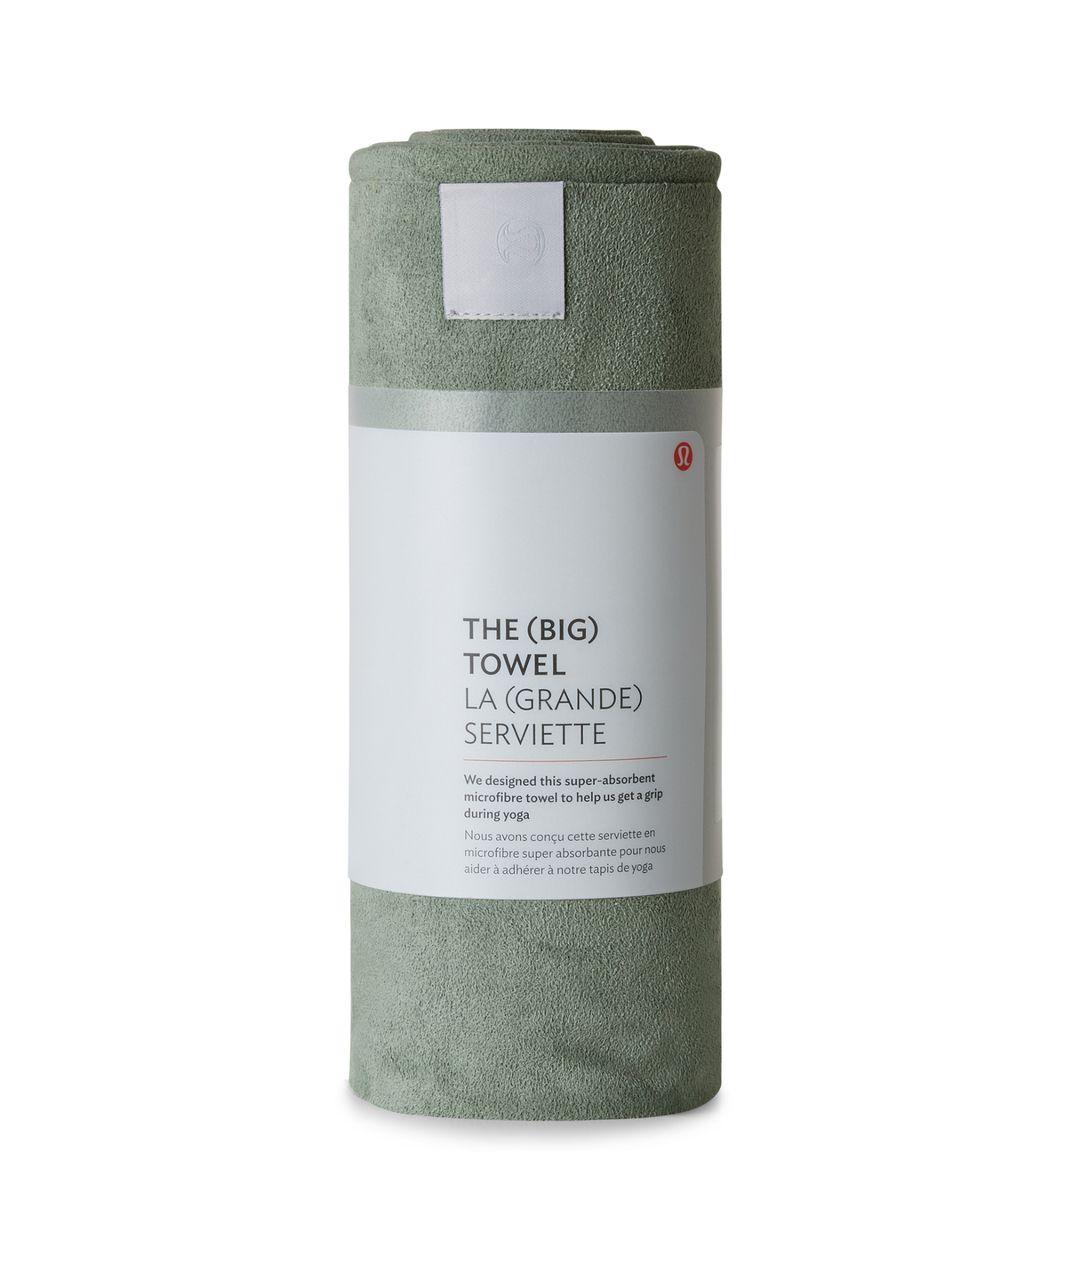 Lululemon The (Big) Towel - Desert Olive